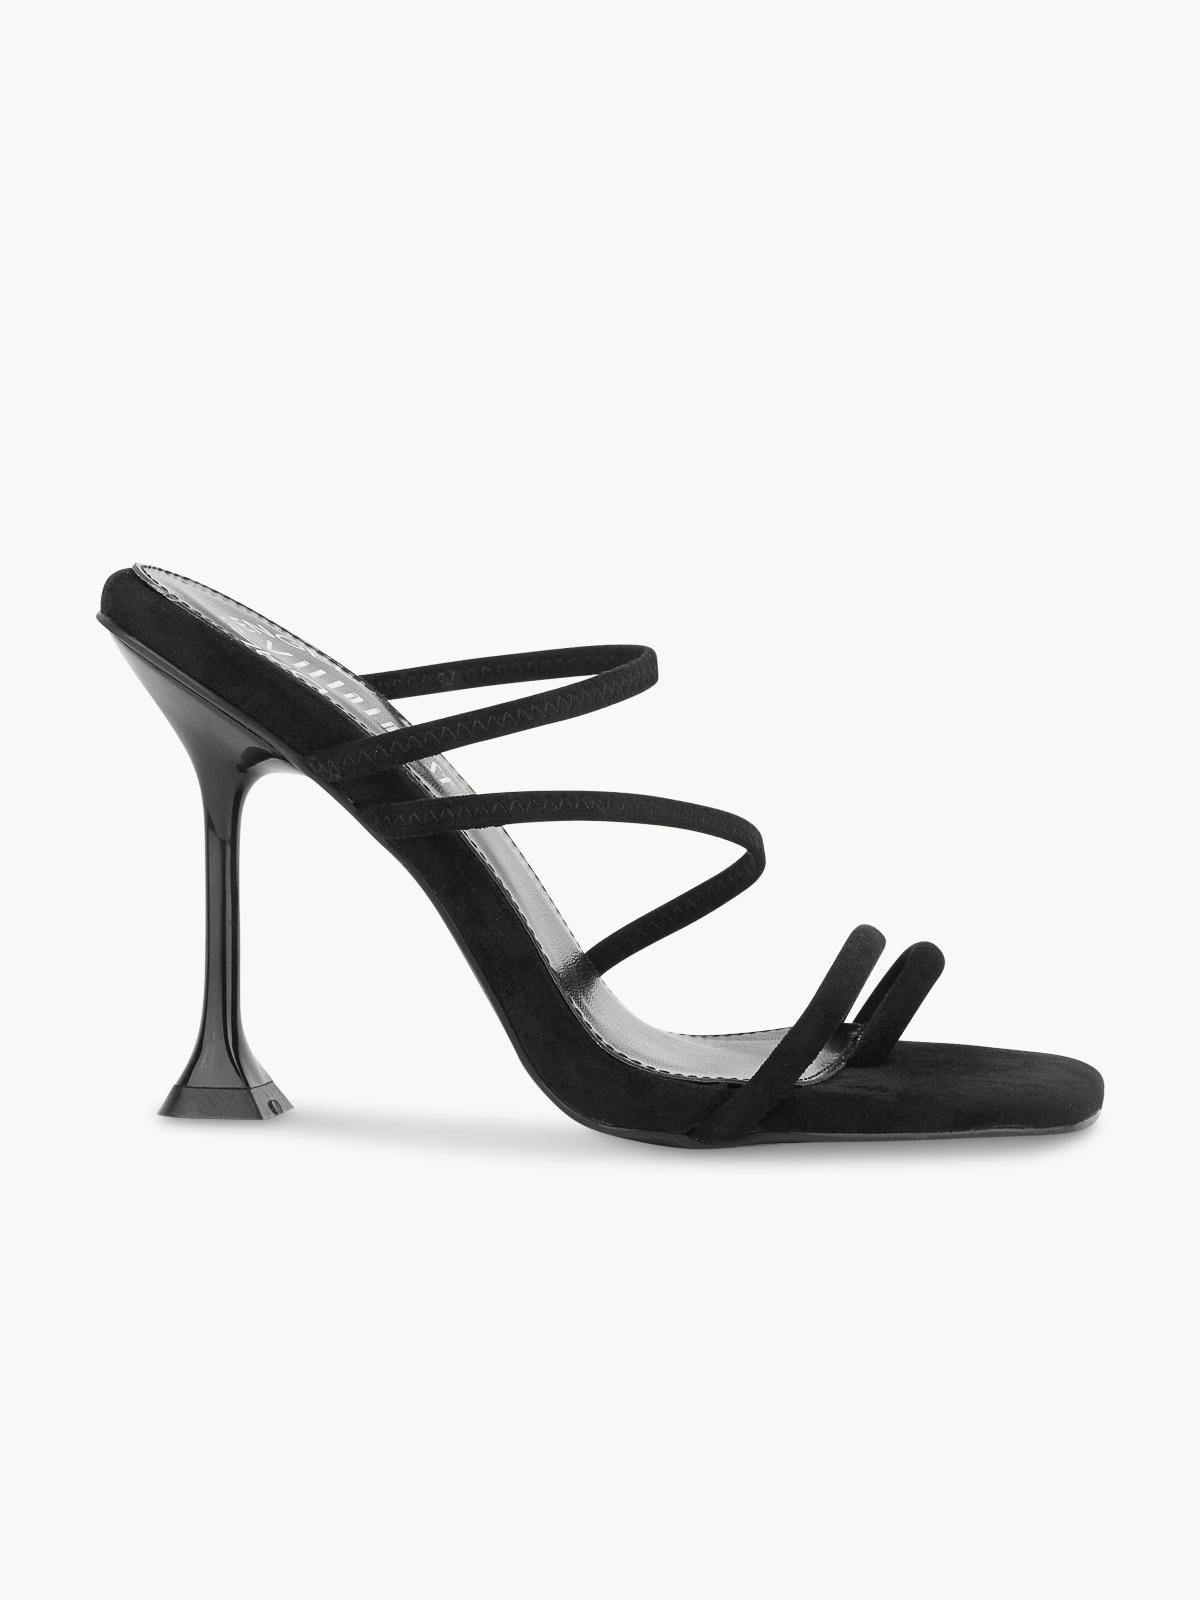 Villains SF Junko Strappy Heels Black